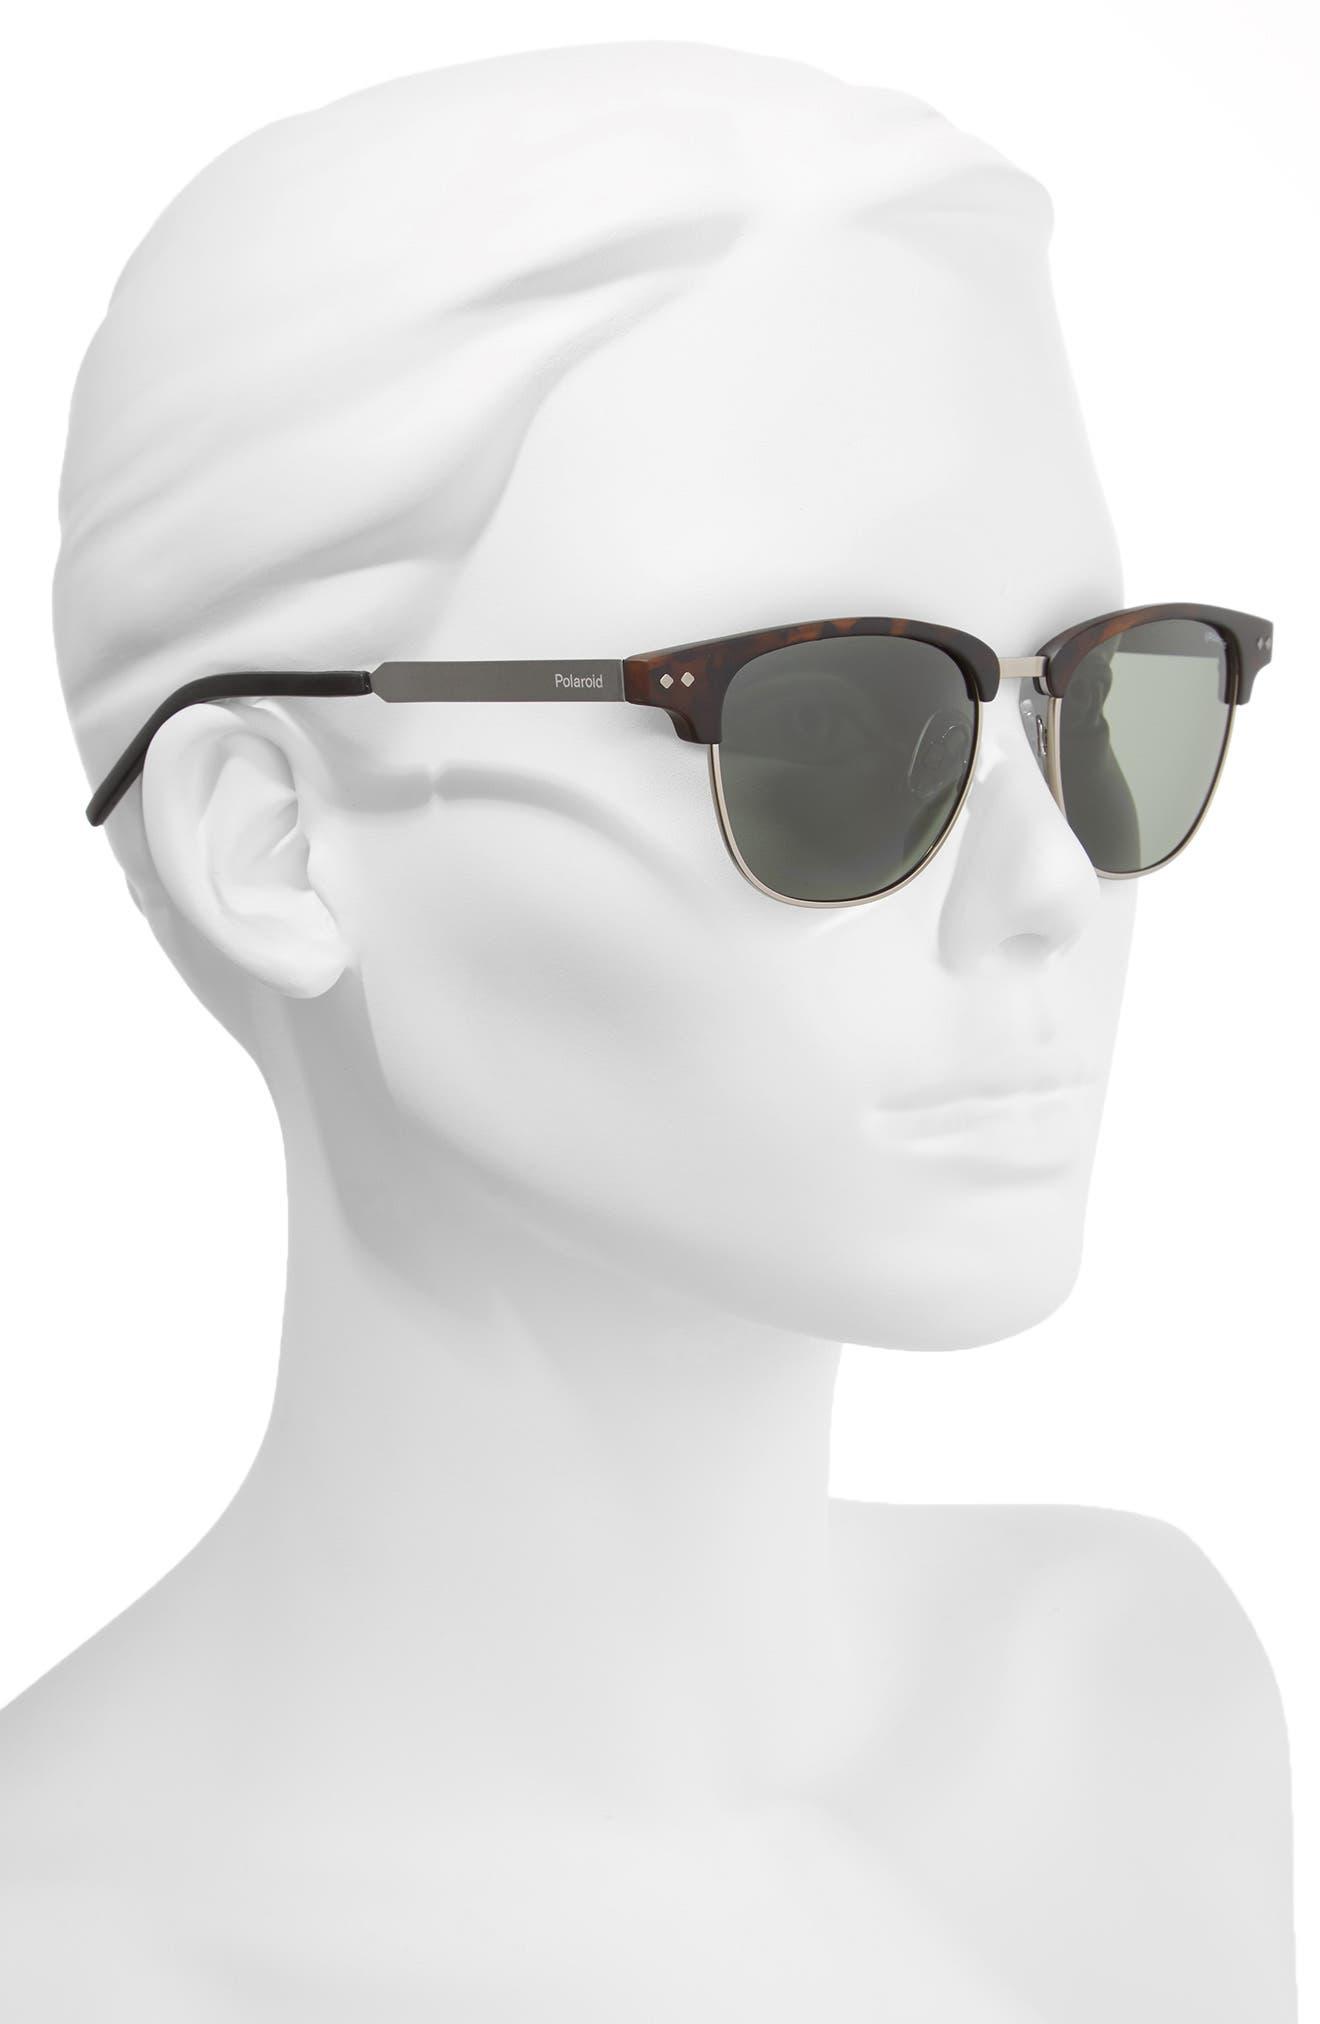 51mm Polarized Cat Eye Sunglasses,                             Alternate thumbnail 2, color,                             Matte Havana